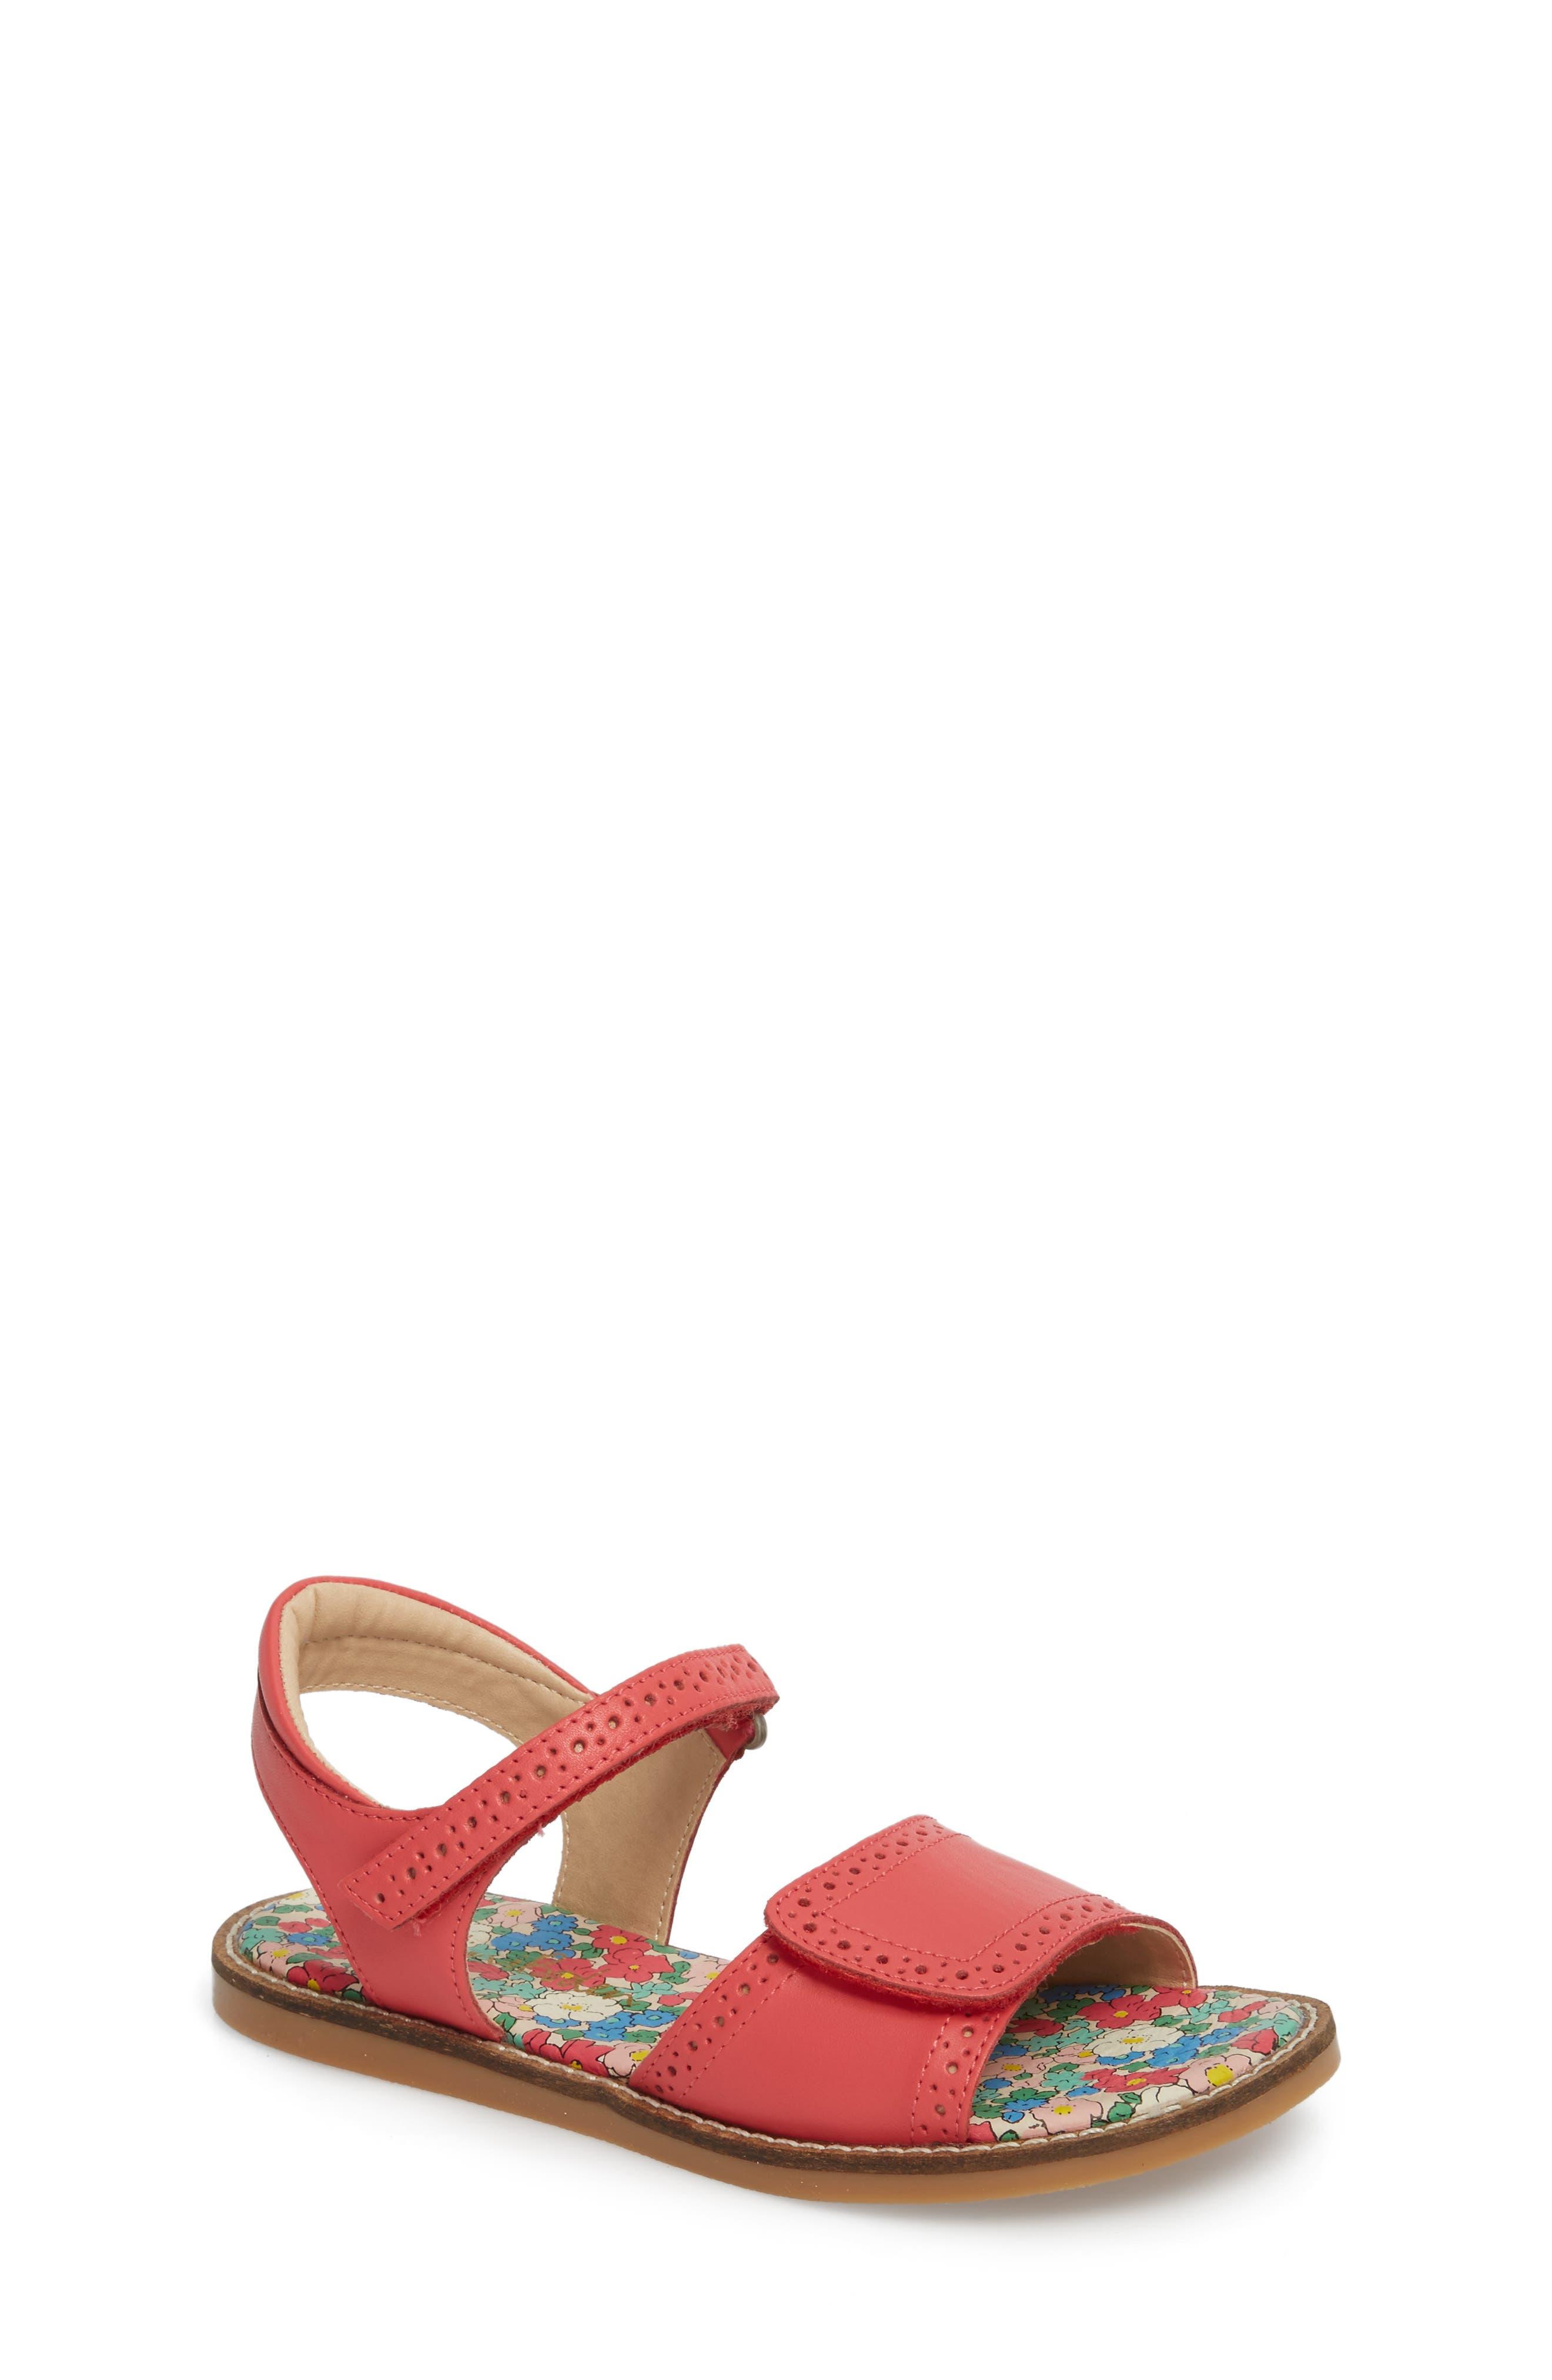 Adjustable Quarter Strap Sandal,                             Main thumbnail 2, color,